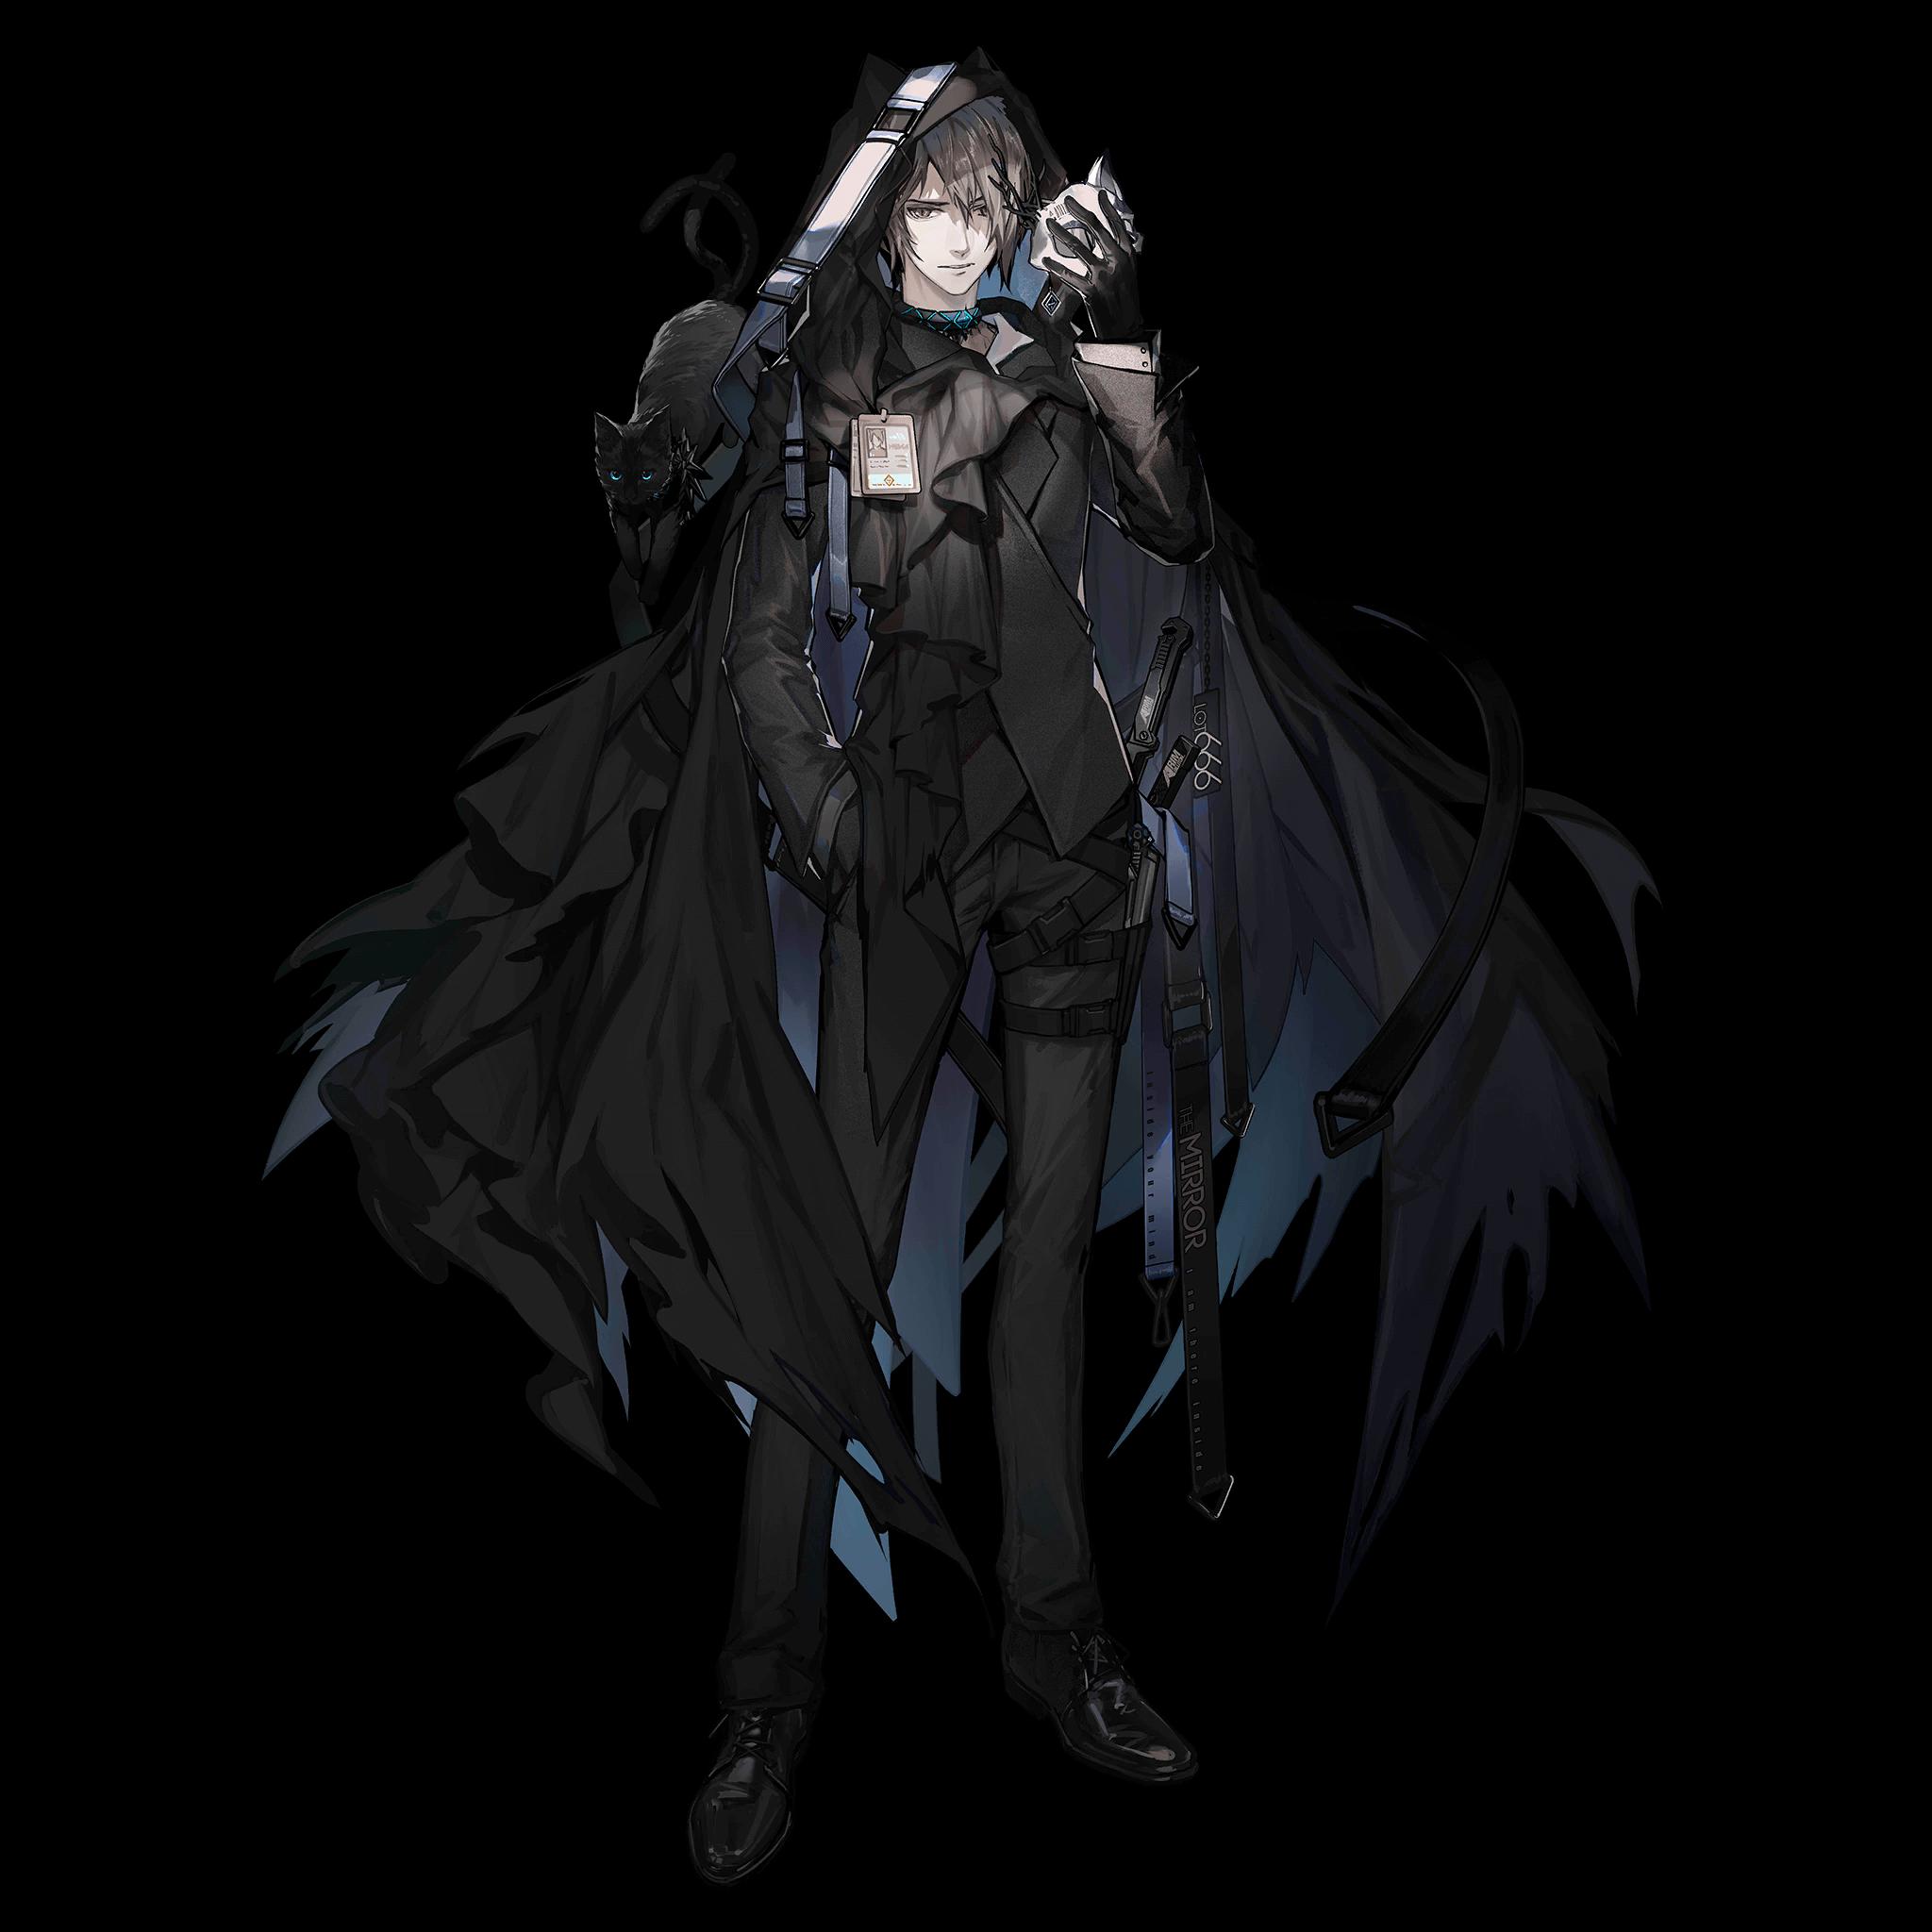 Phantom | Arknights Wiki - GamePress